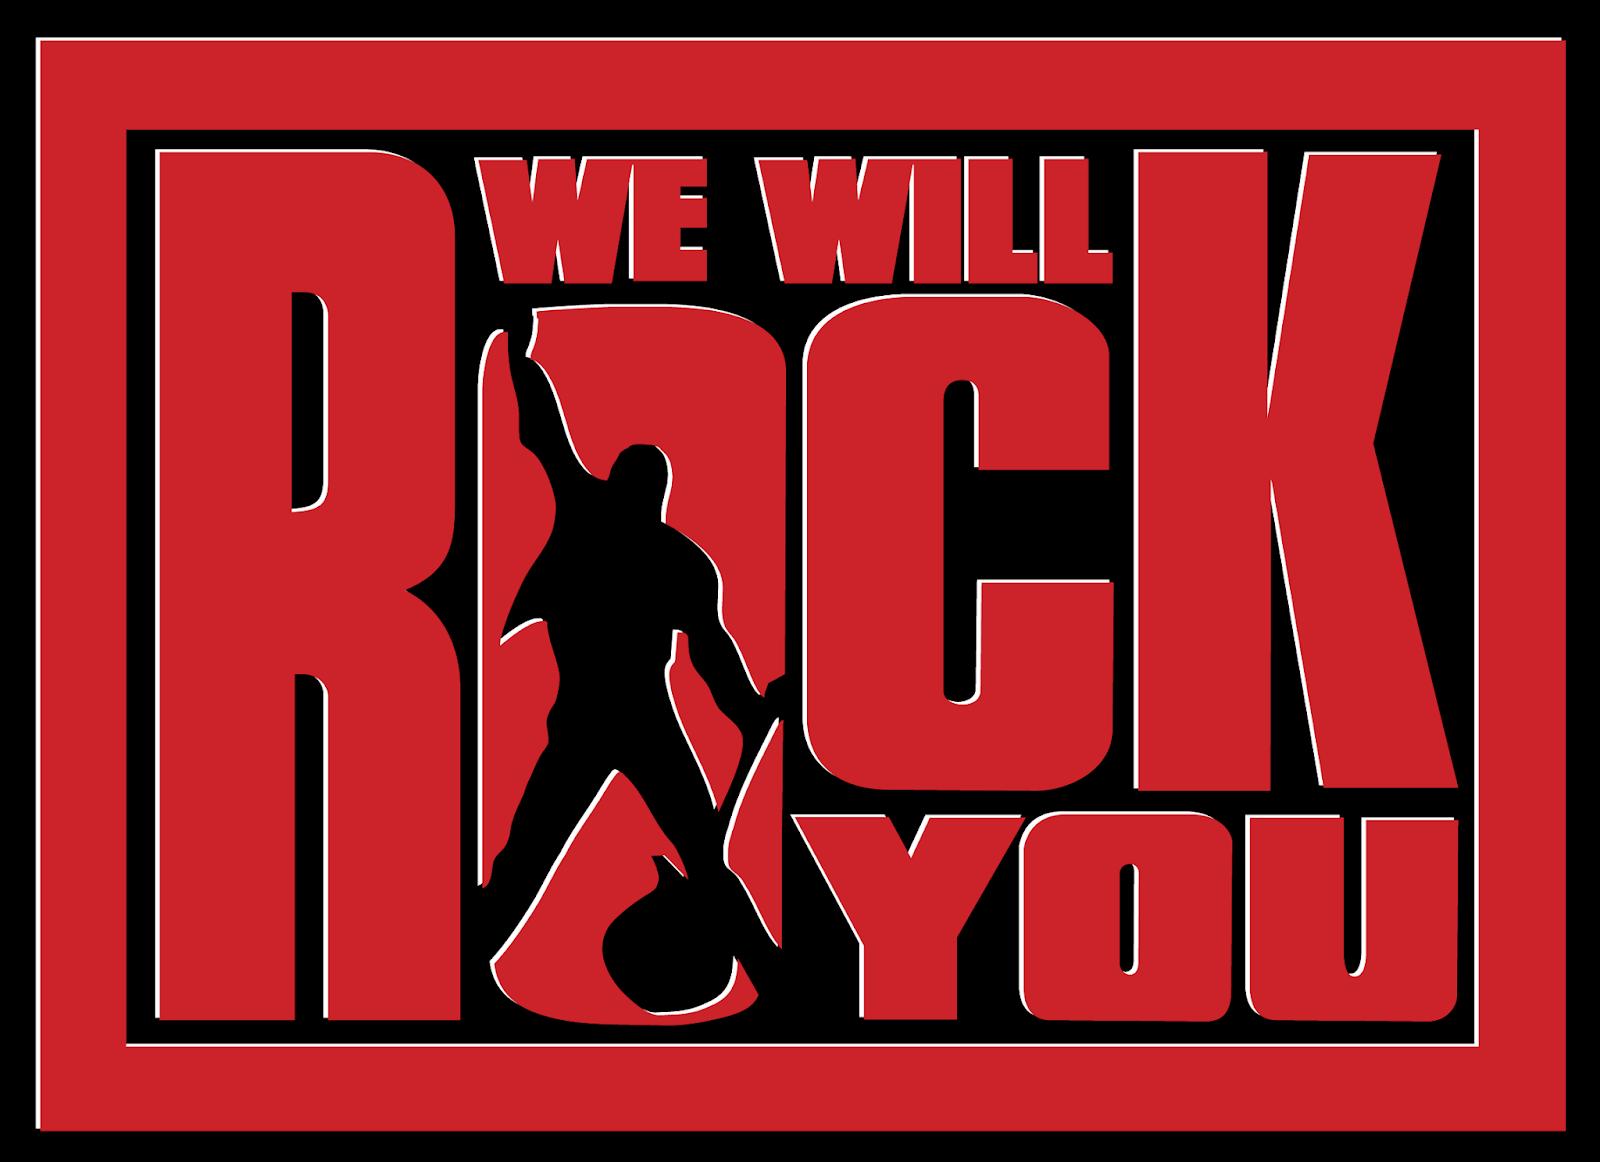 We Will Rock